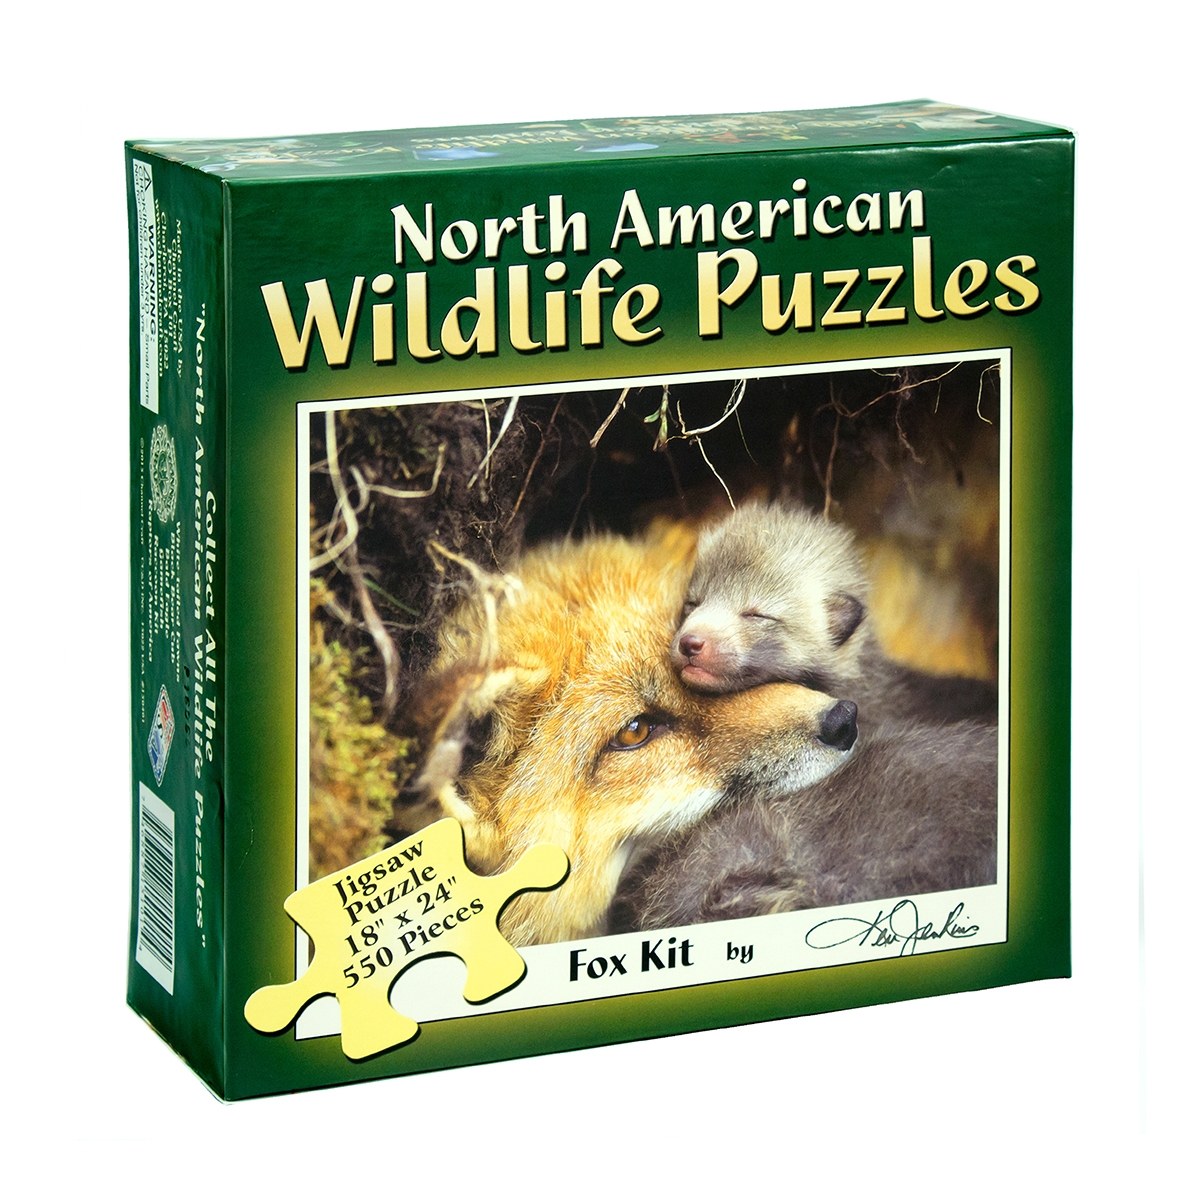 Fox Kit Puzzle